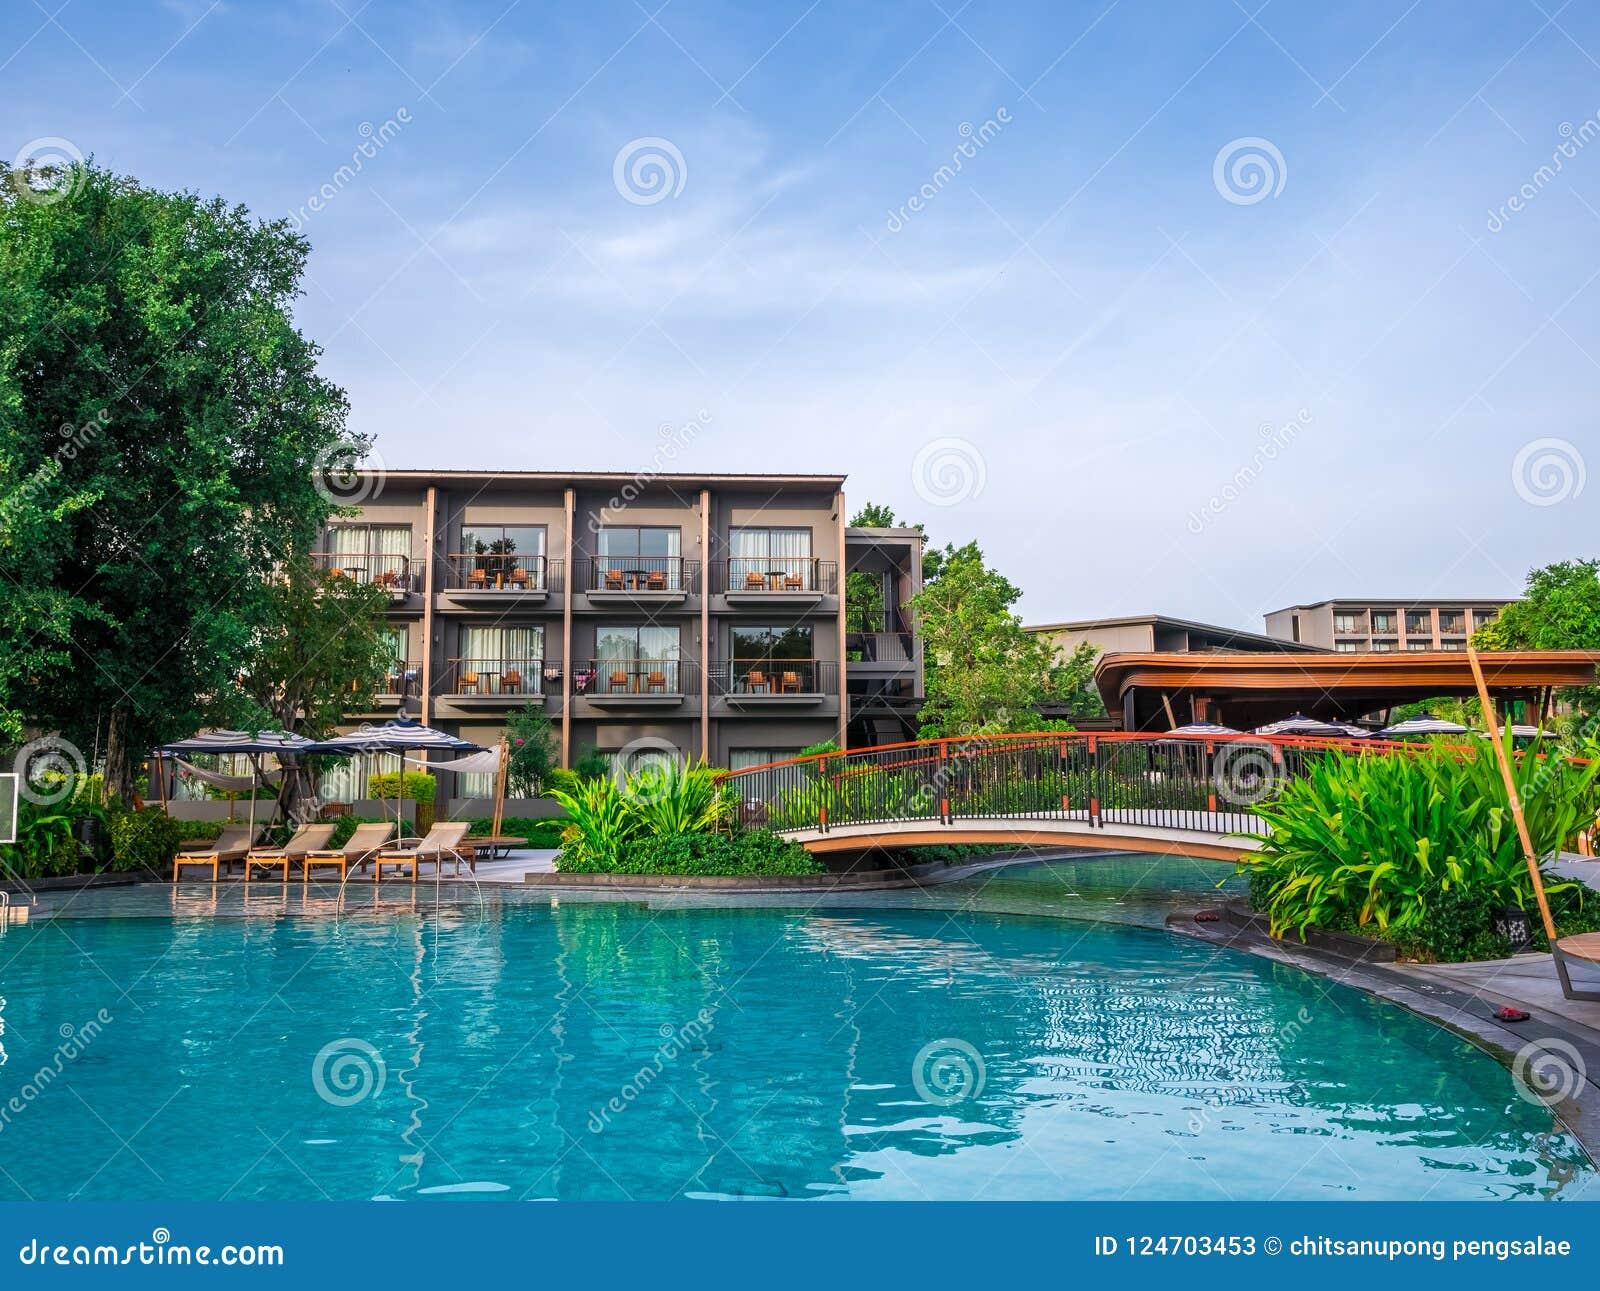 Hua Hin Thailand June 23 2018 The Five Star Is Hua Hin Marriott